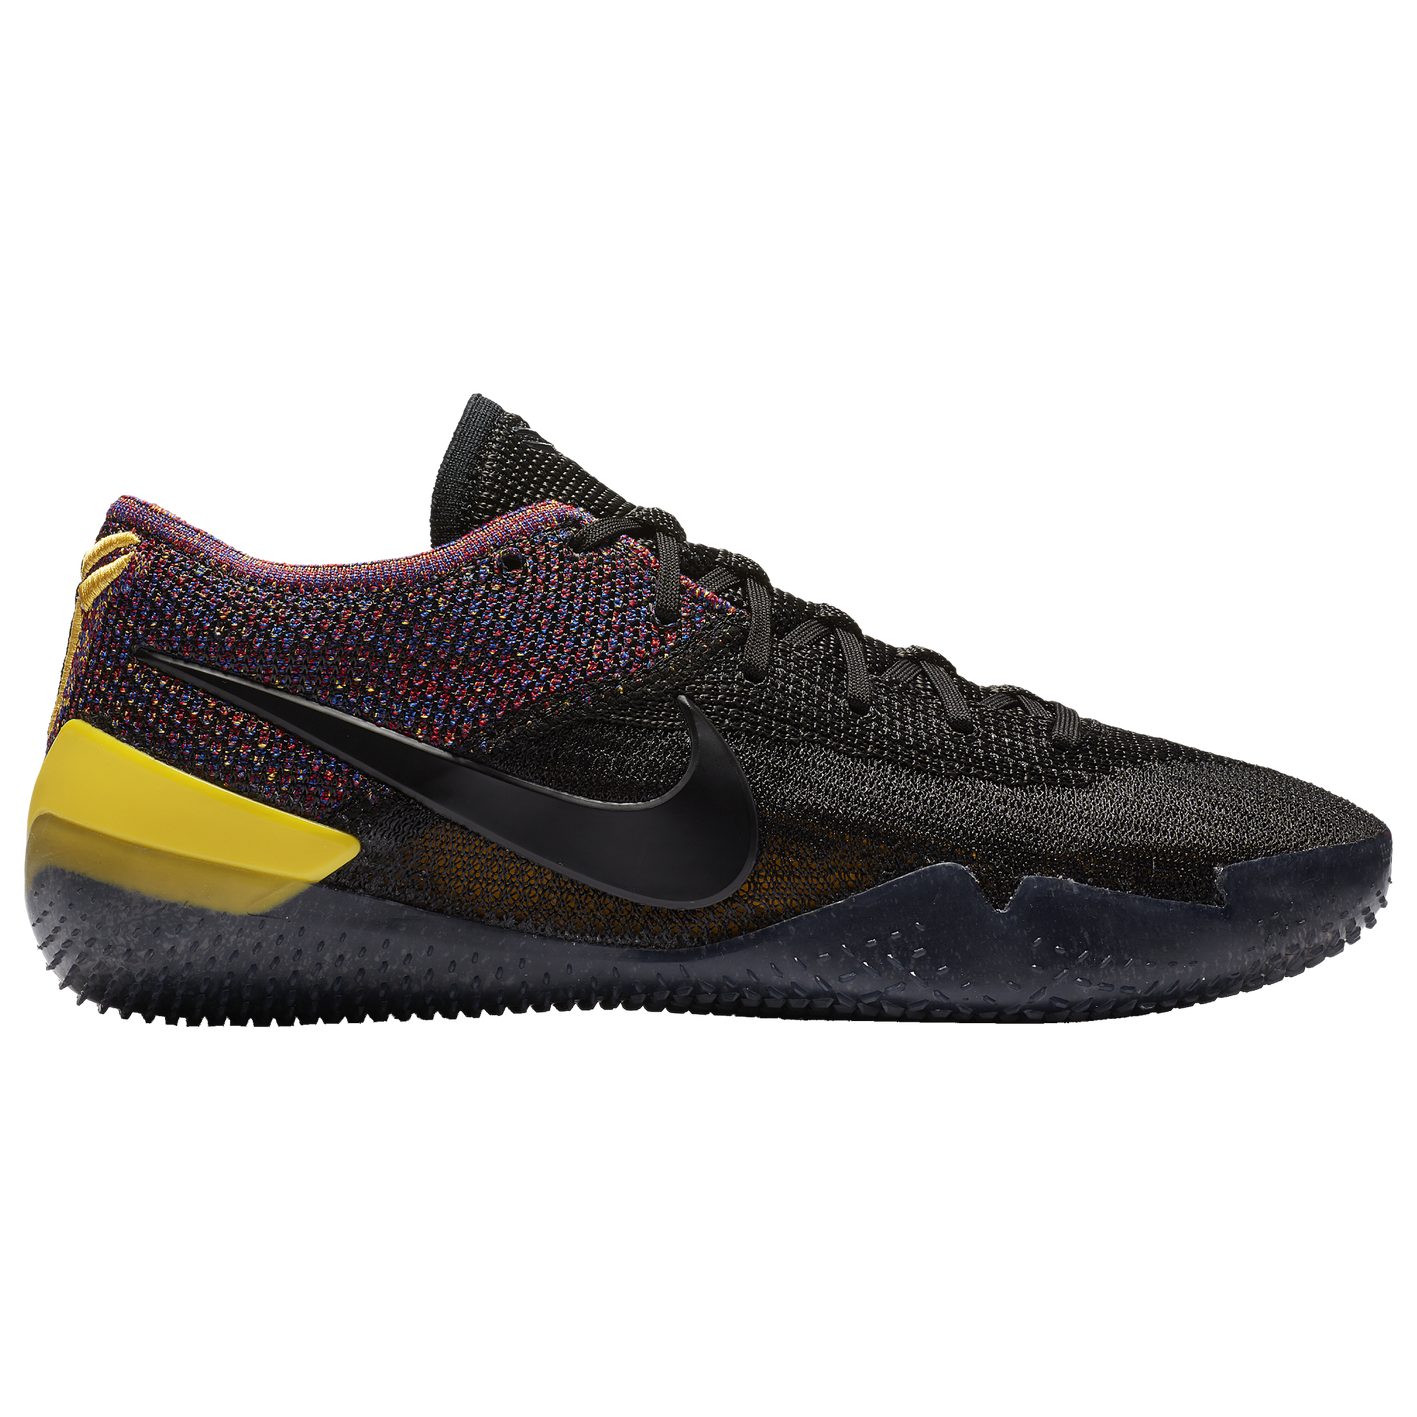 beb100eeafdd Nike Kobe AD NXT 360 - Men s - Basketball - Shoes - Bryant